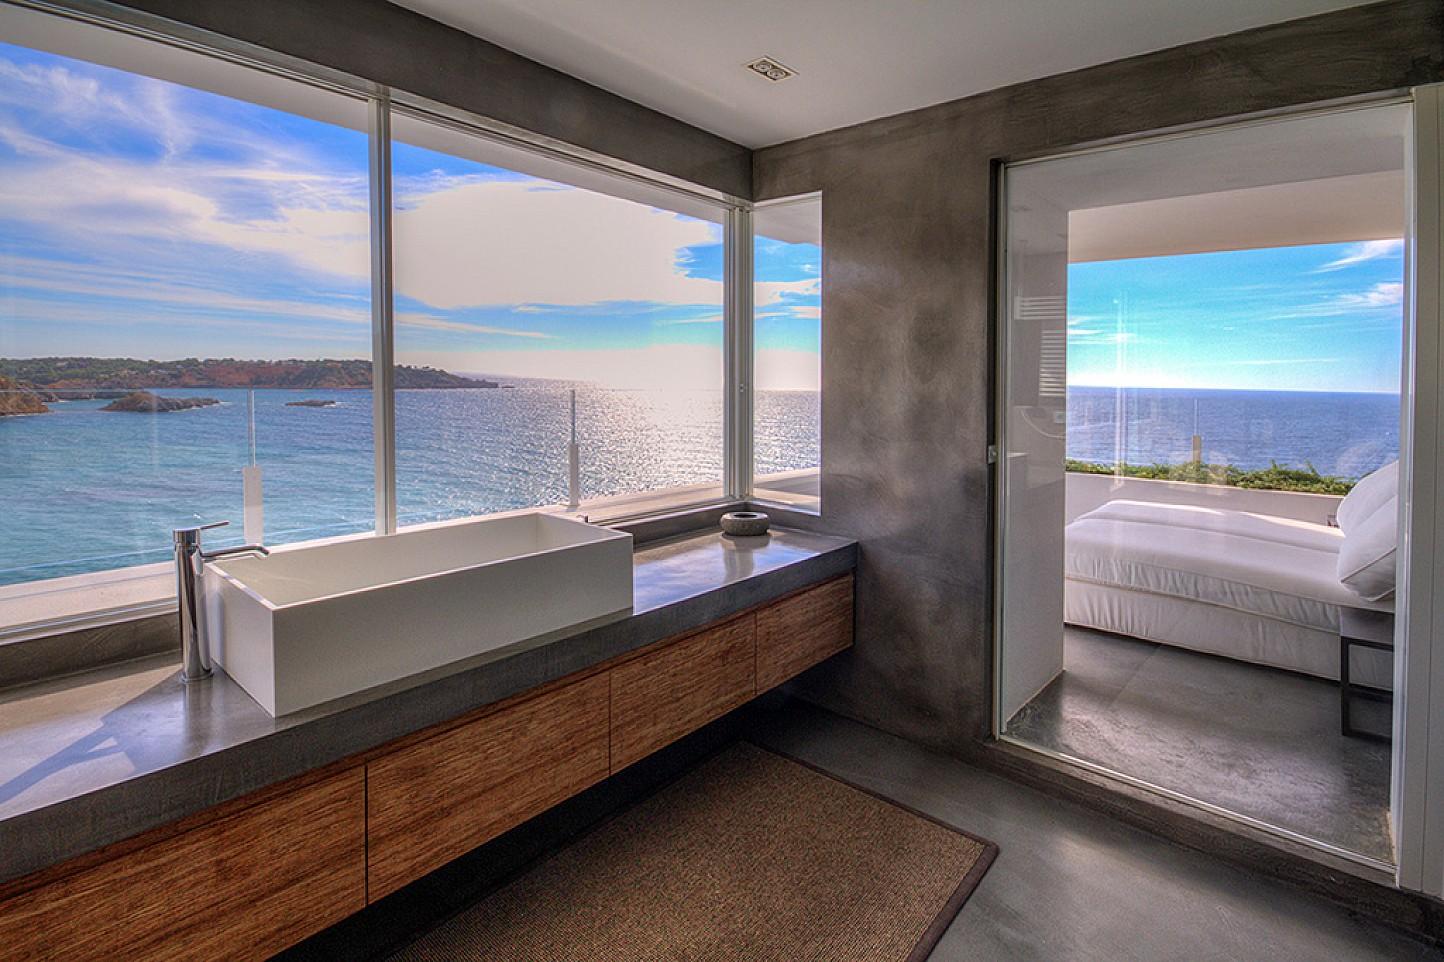 Ванная комната виллы в аренду в Виста Алегре